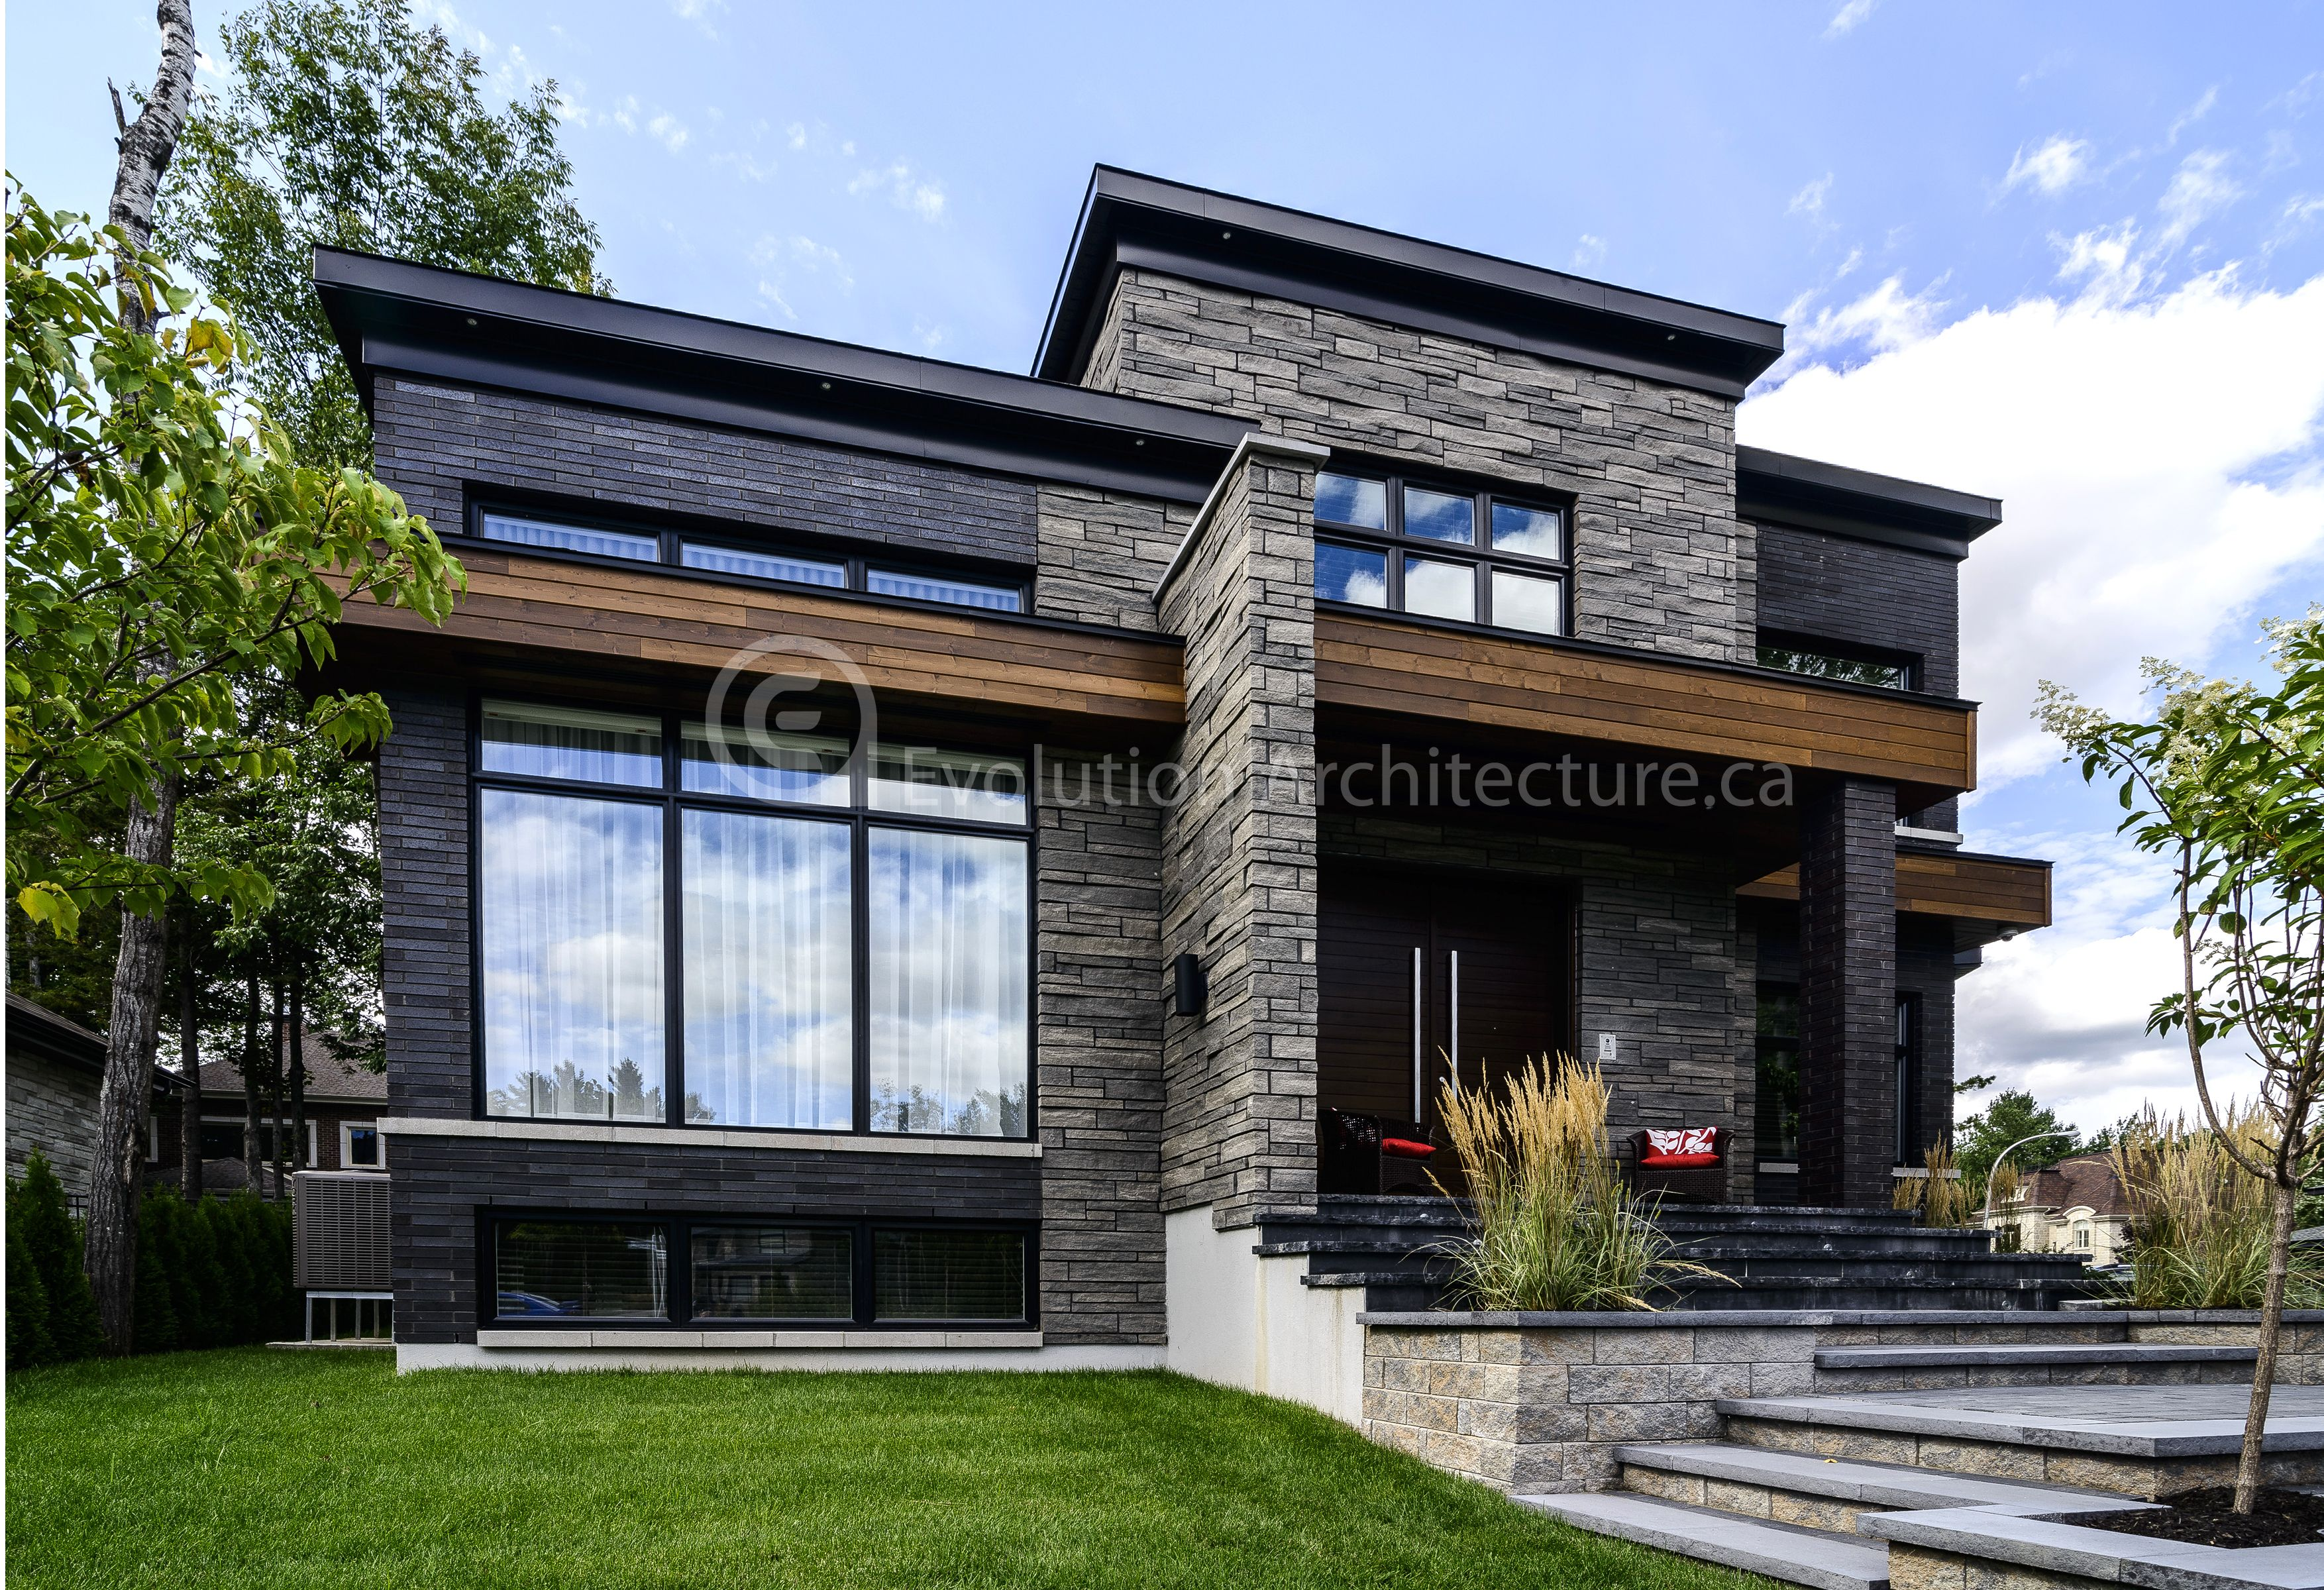 Evolution Architecture Maison Moderne Creation Exclusive E 851 Modern House Design Modern House Exterior House